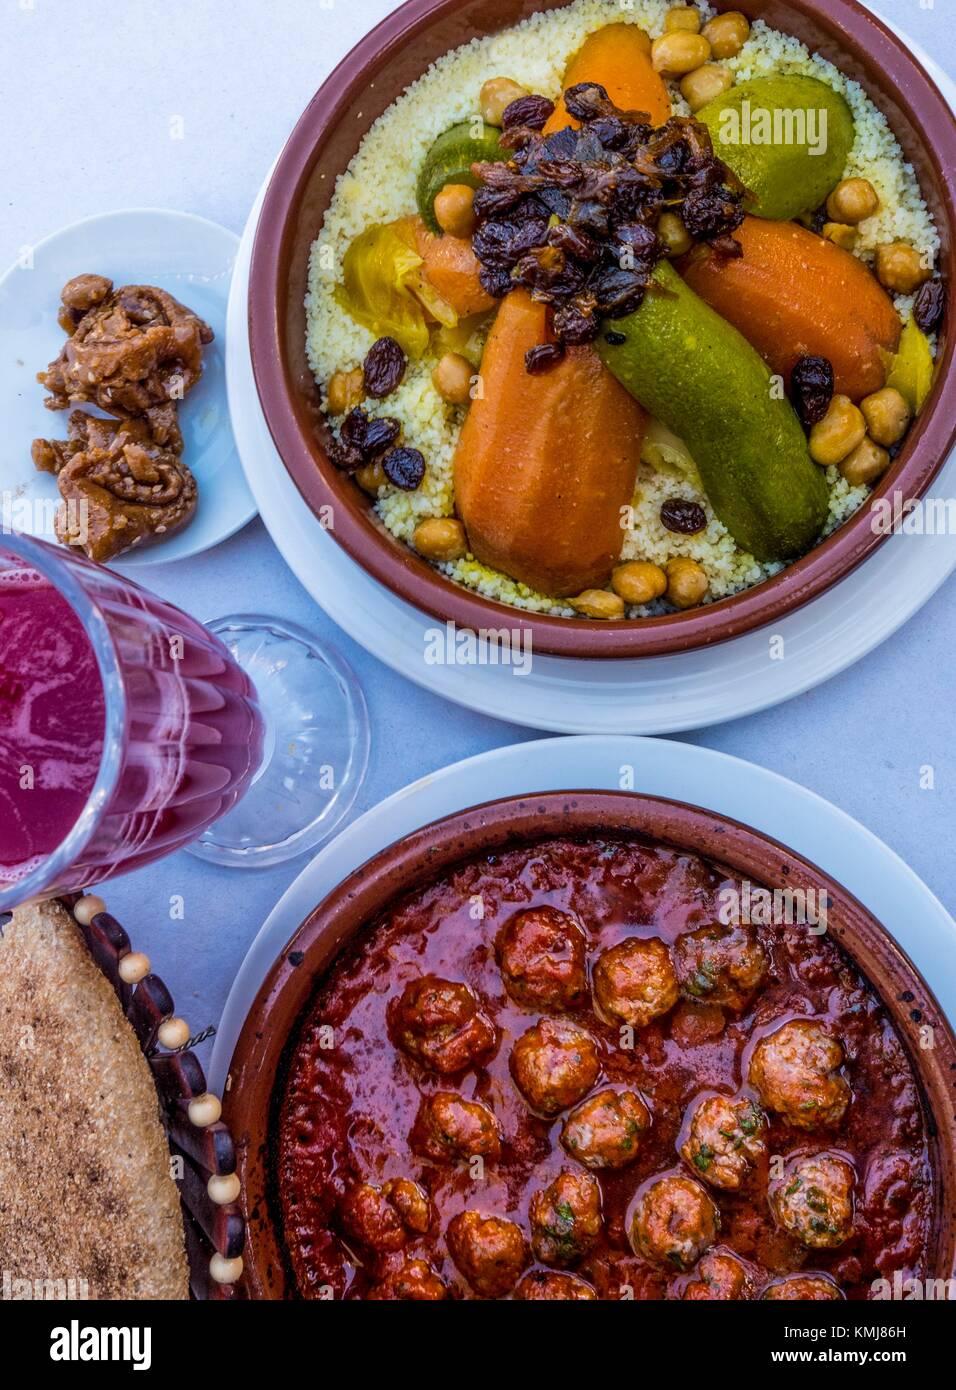 Morocco, Food, 'Kesra' bread, Pomegranate juice. 'Chebakia' sweet honney cake, 'Kefta tagine' - Stock Image